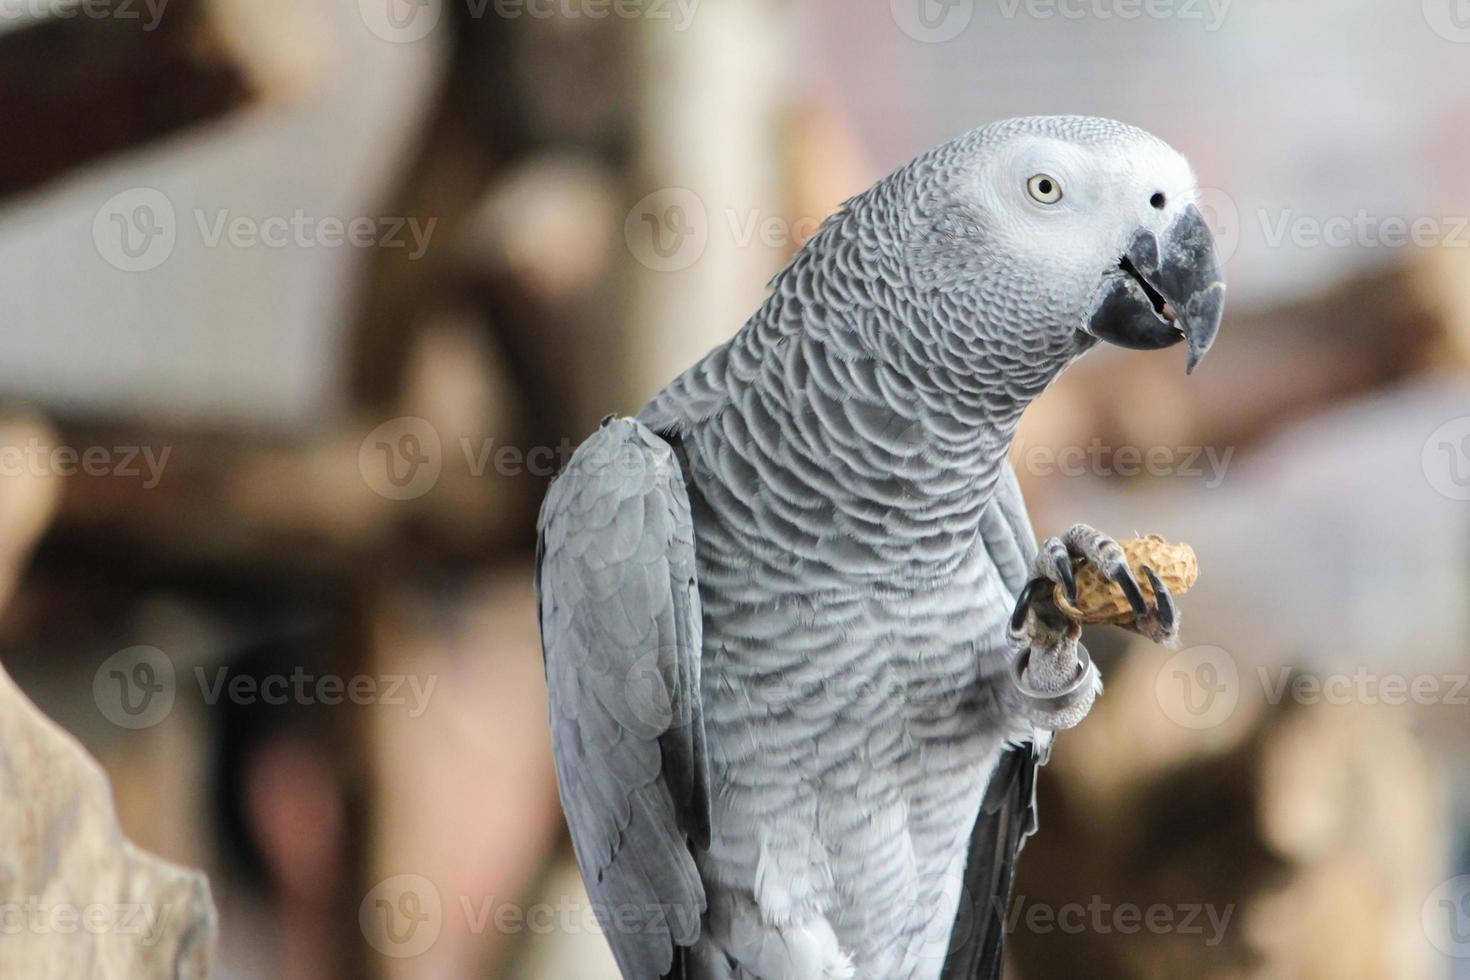 gris africano foto